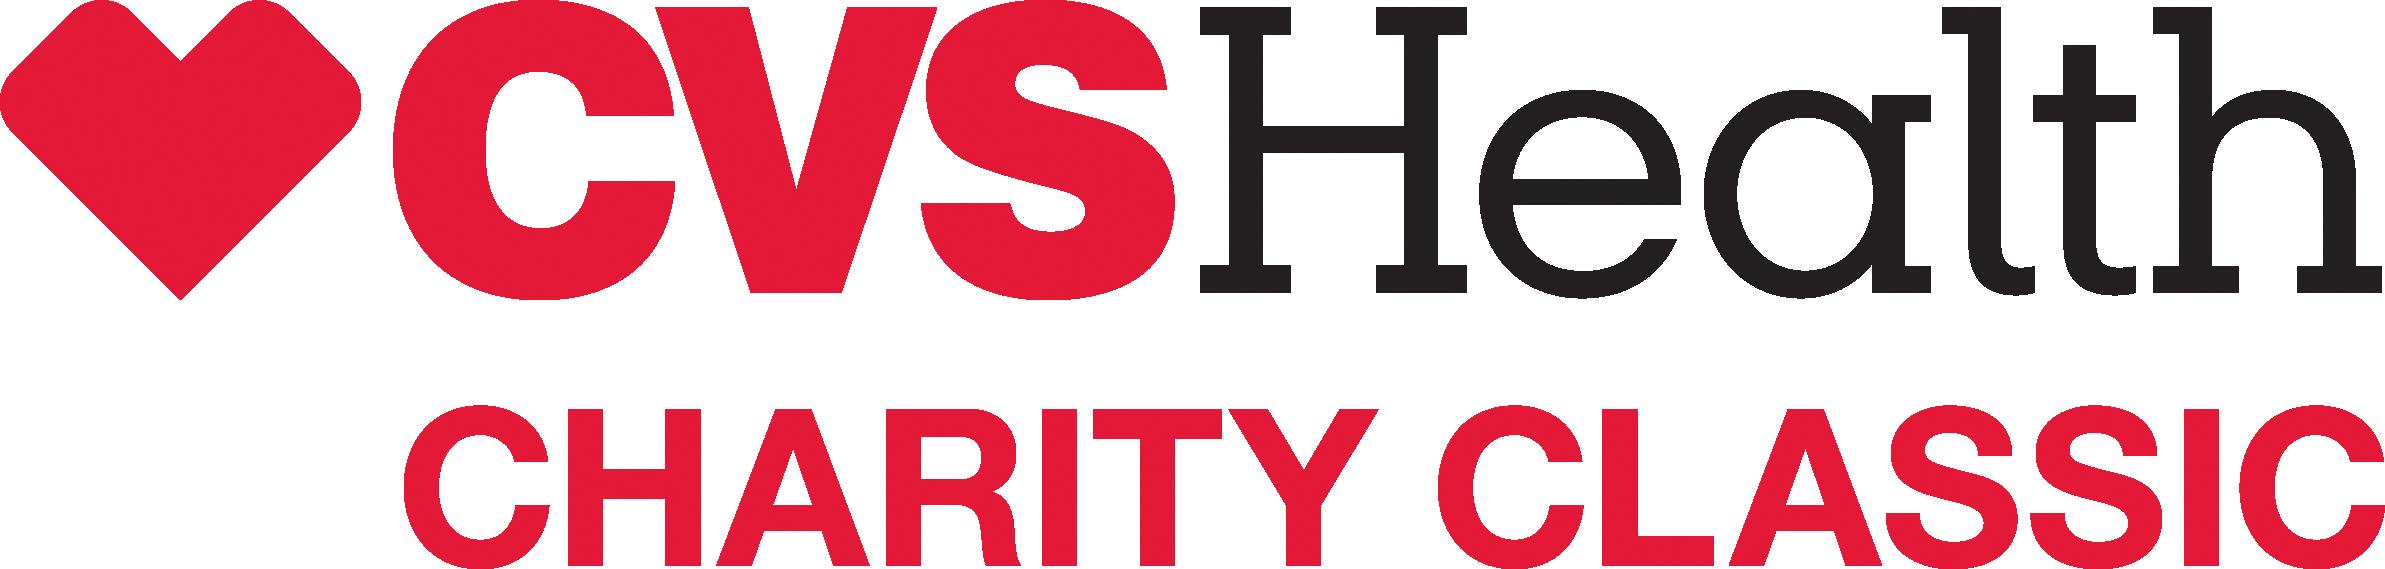 CVS Charity Golf Classic Logo